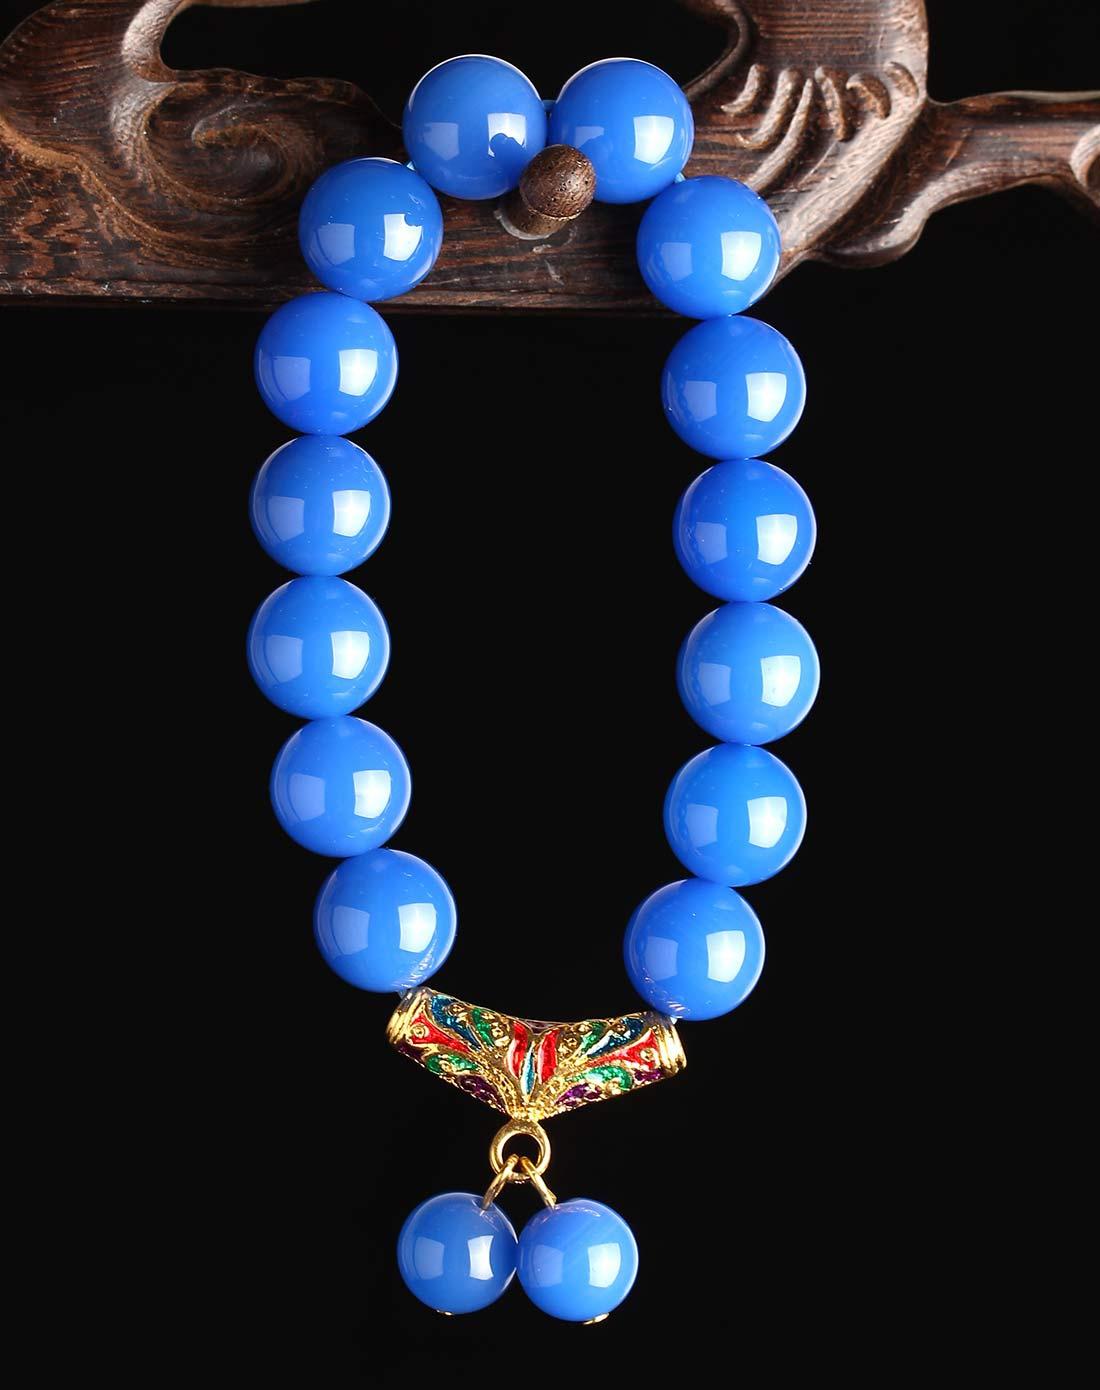 3a级天然蓝玛瑙圆珠鎏金镶嵌手链附证书